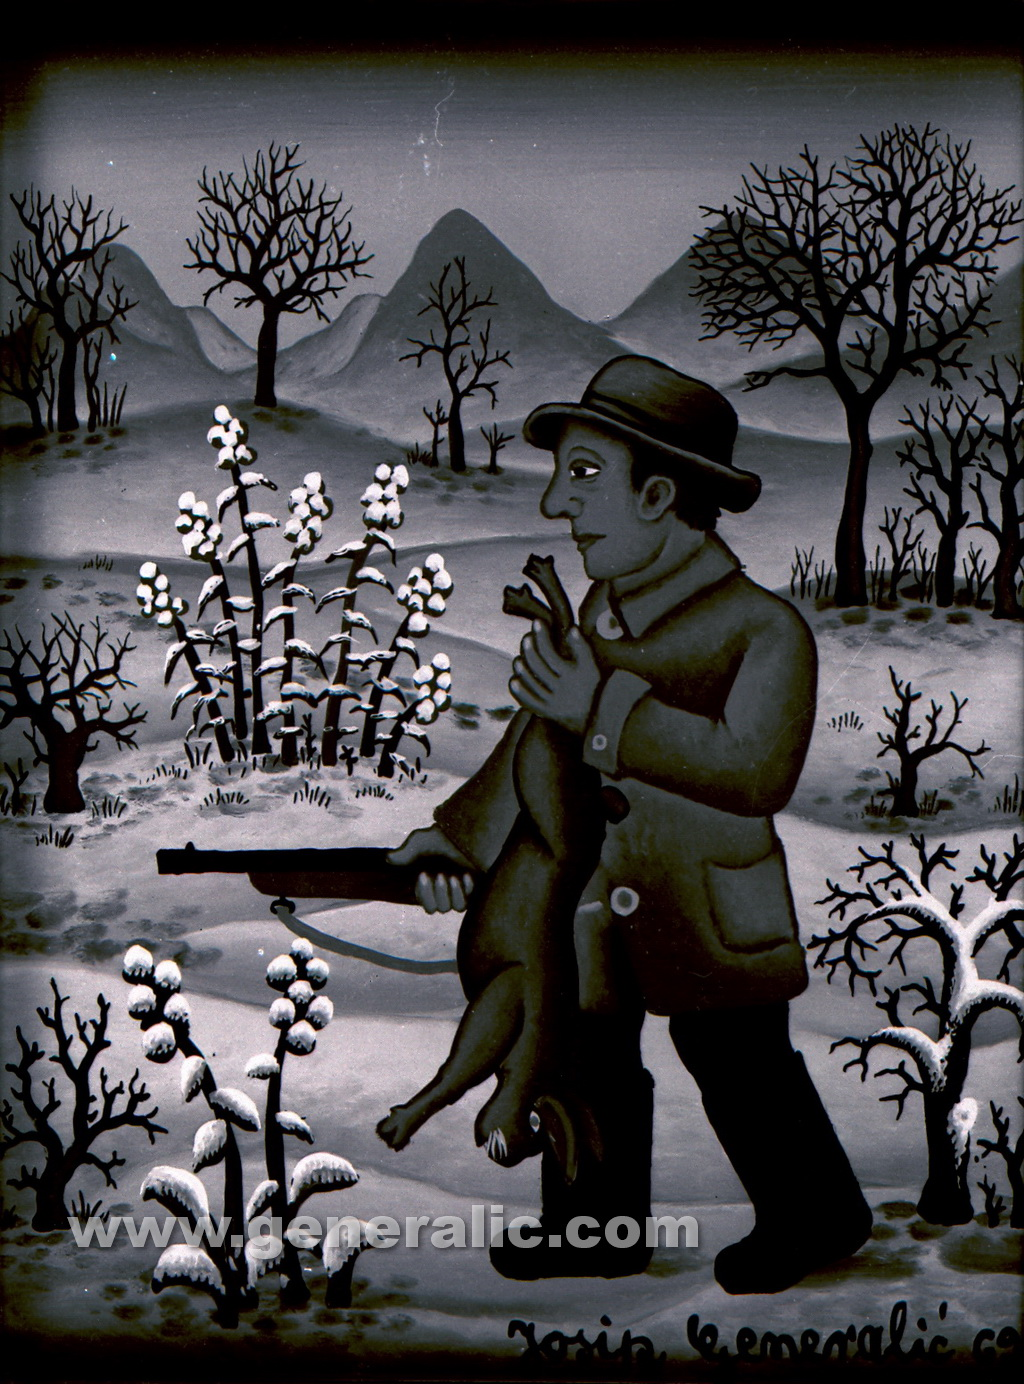 Josip Generalic, 1969, Hunter with a rabbit in winter, oil on glass